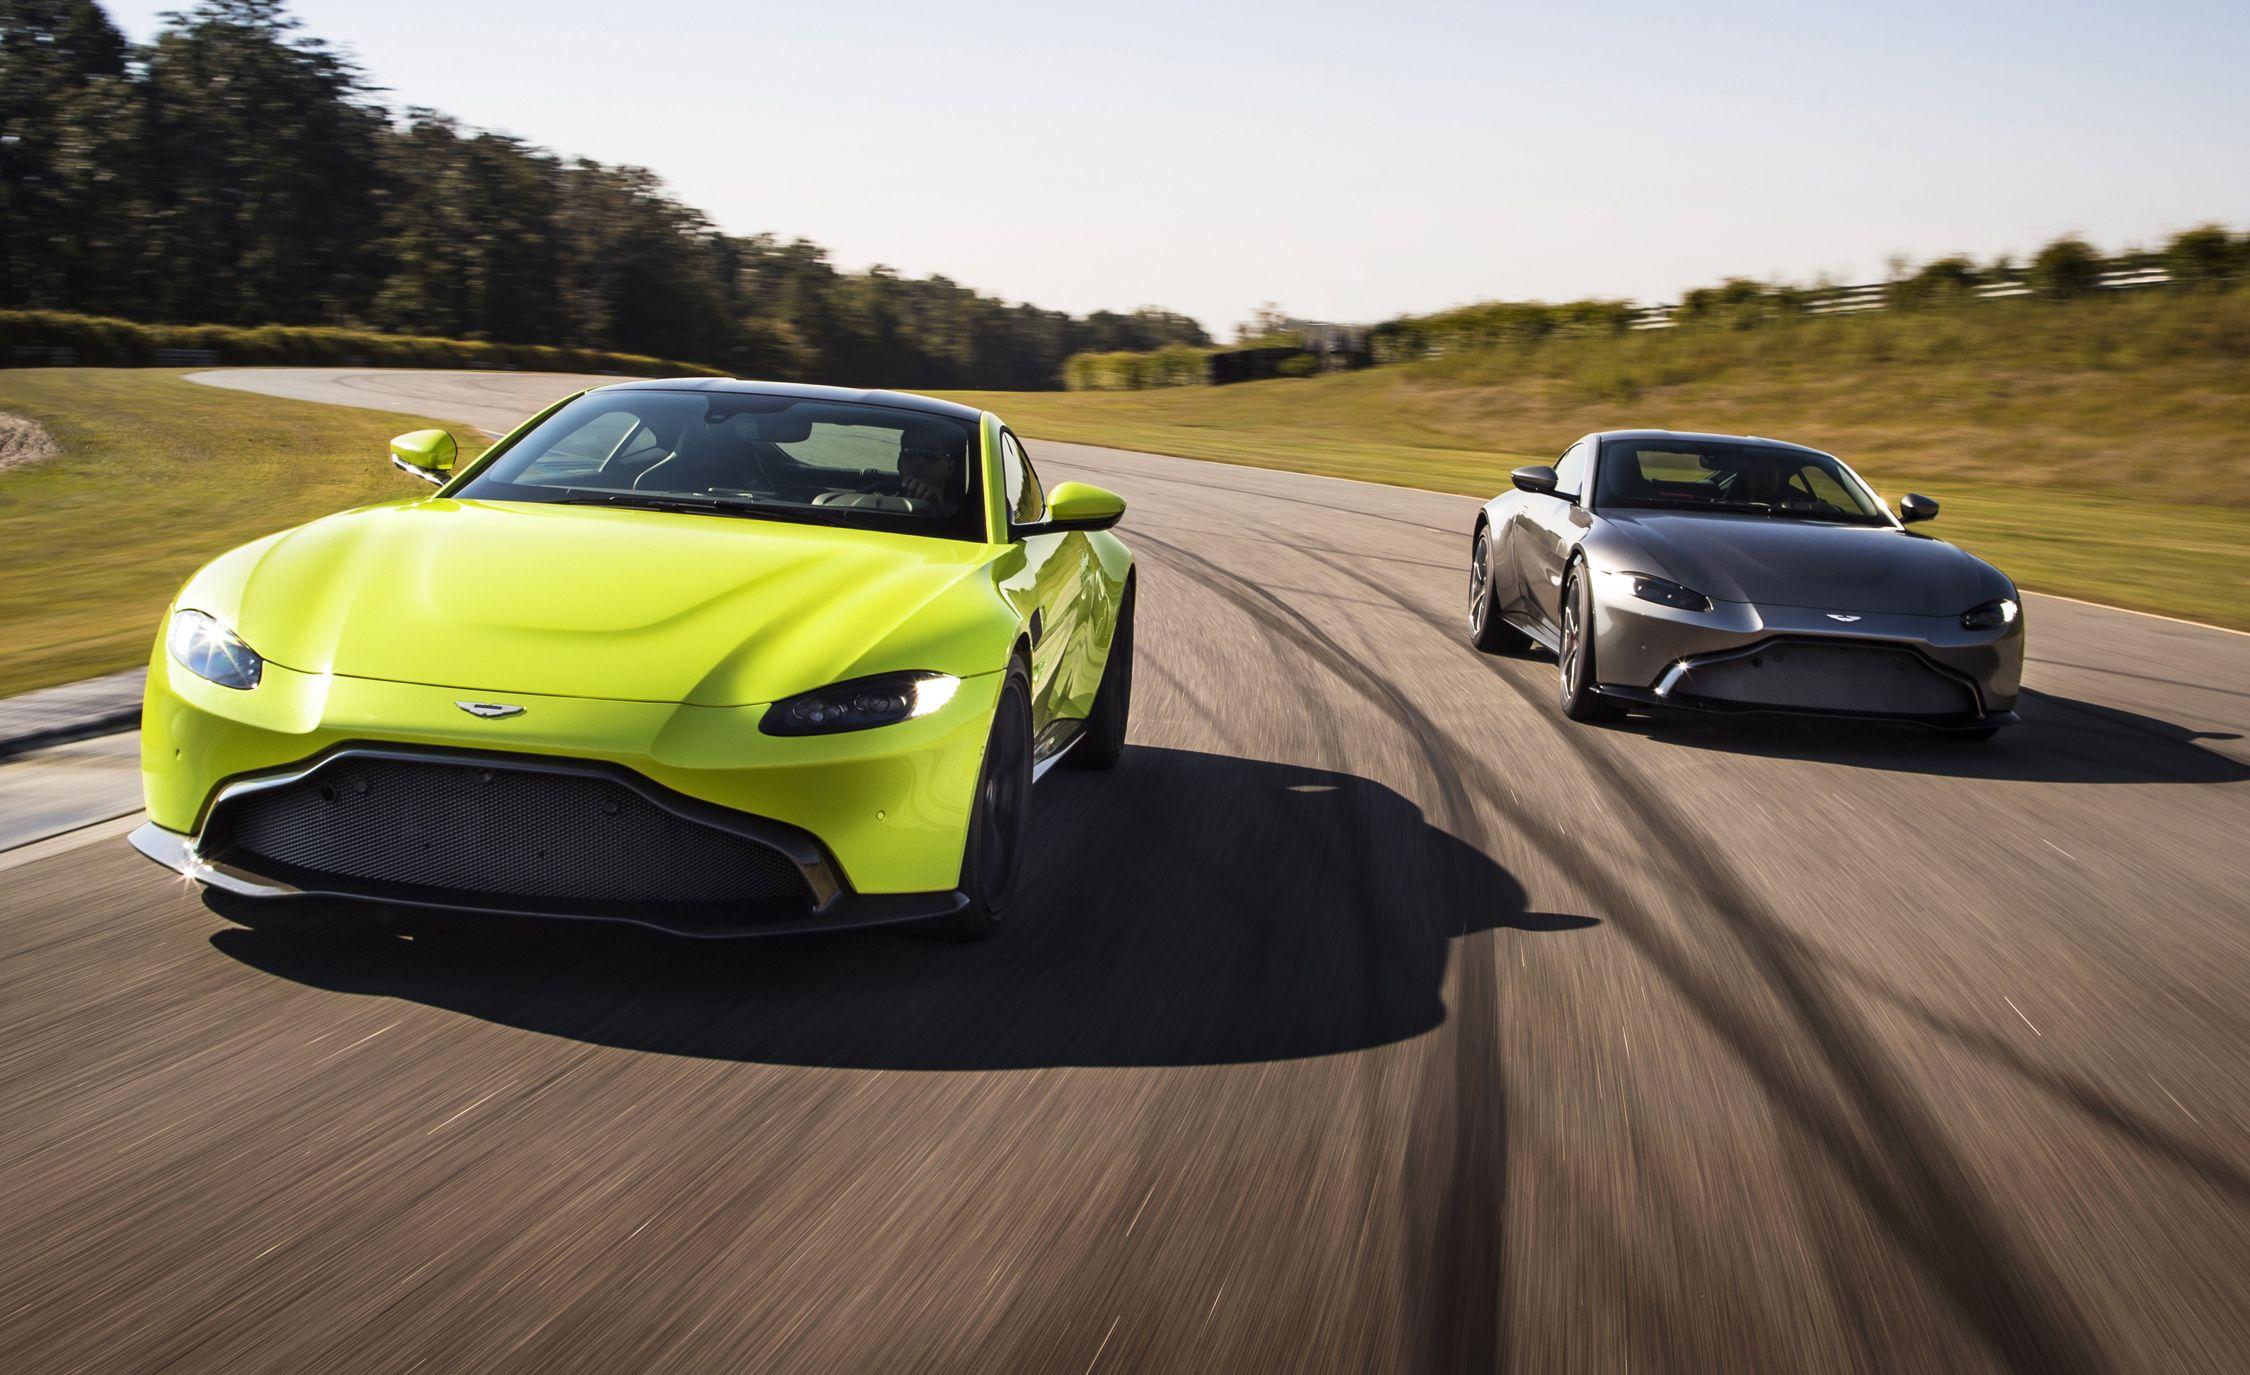 2019 Aston Martin Vantage: Predictably Stunning